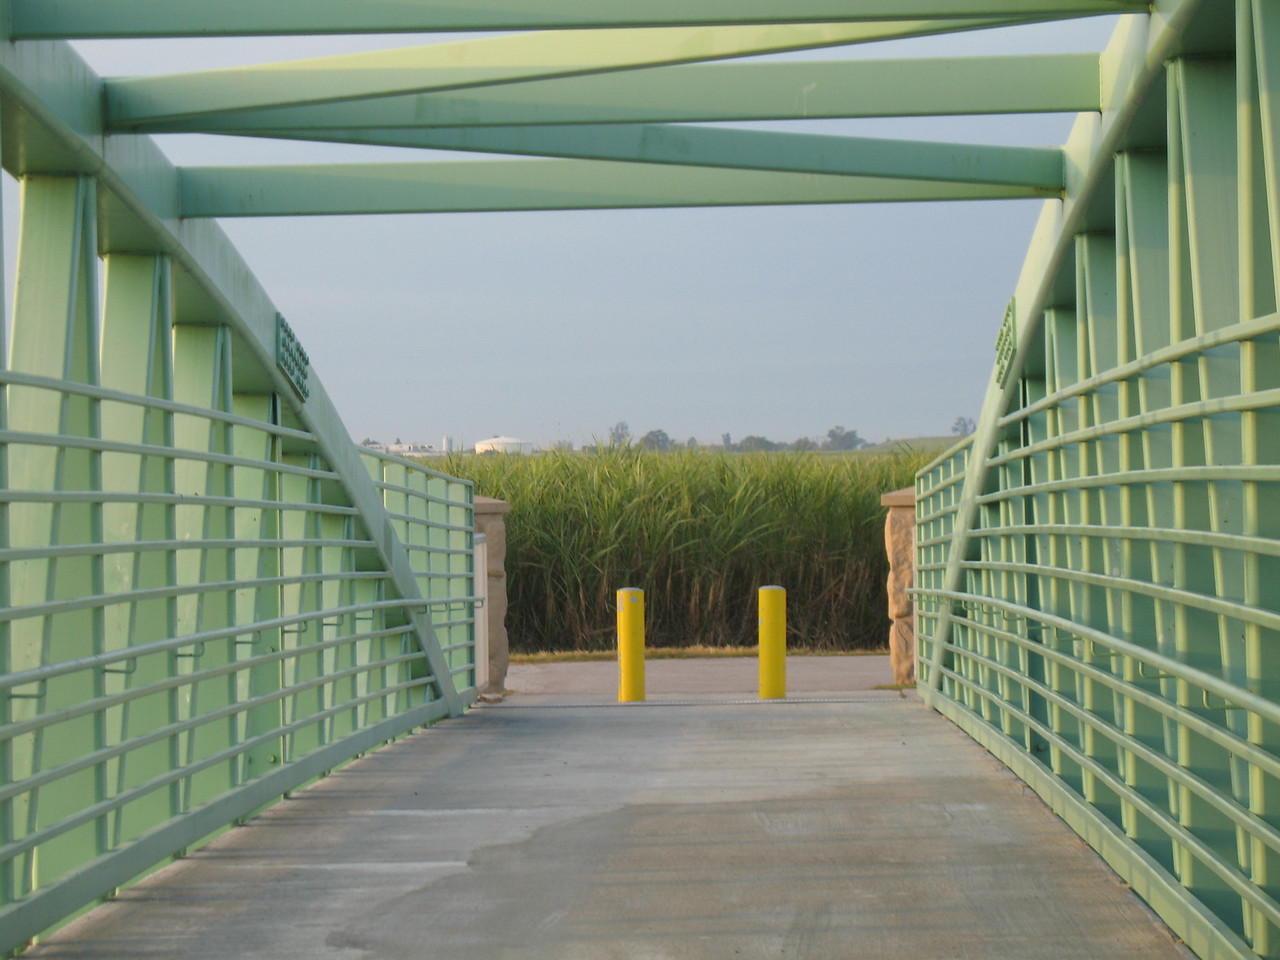 Wall of sugar cane at the bridge at Belle Glade<br /> PHOTO CREDIT: Sandra Friend / Florida Trail Association